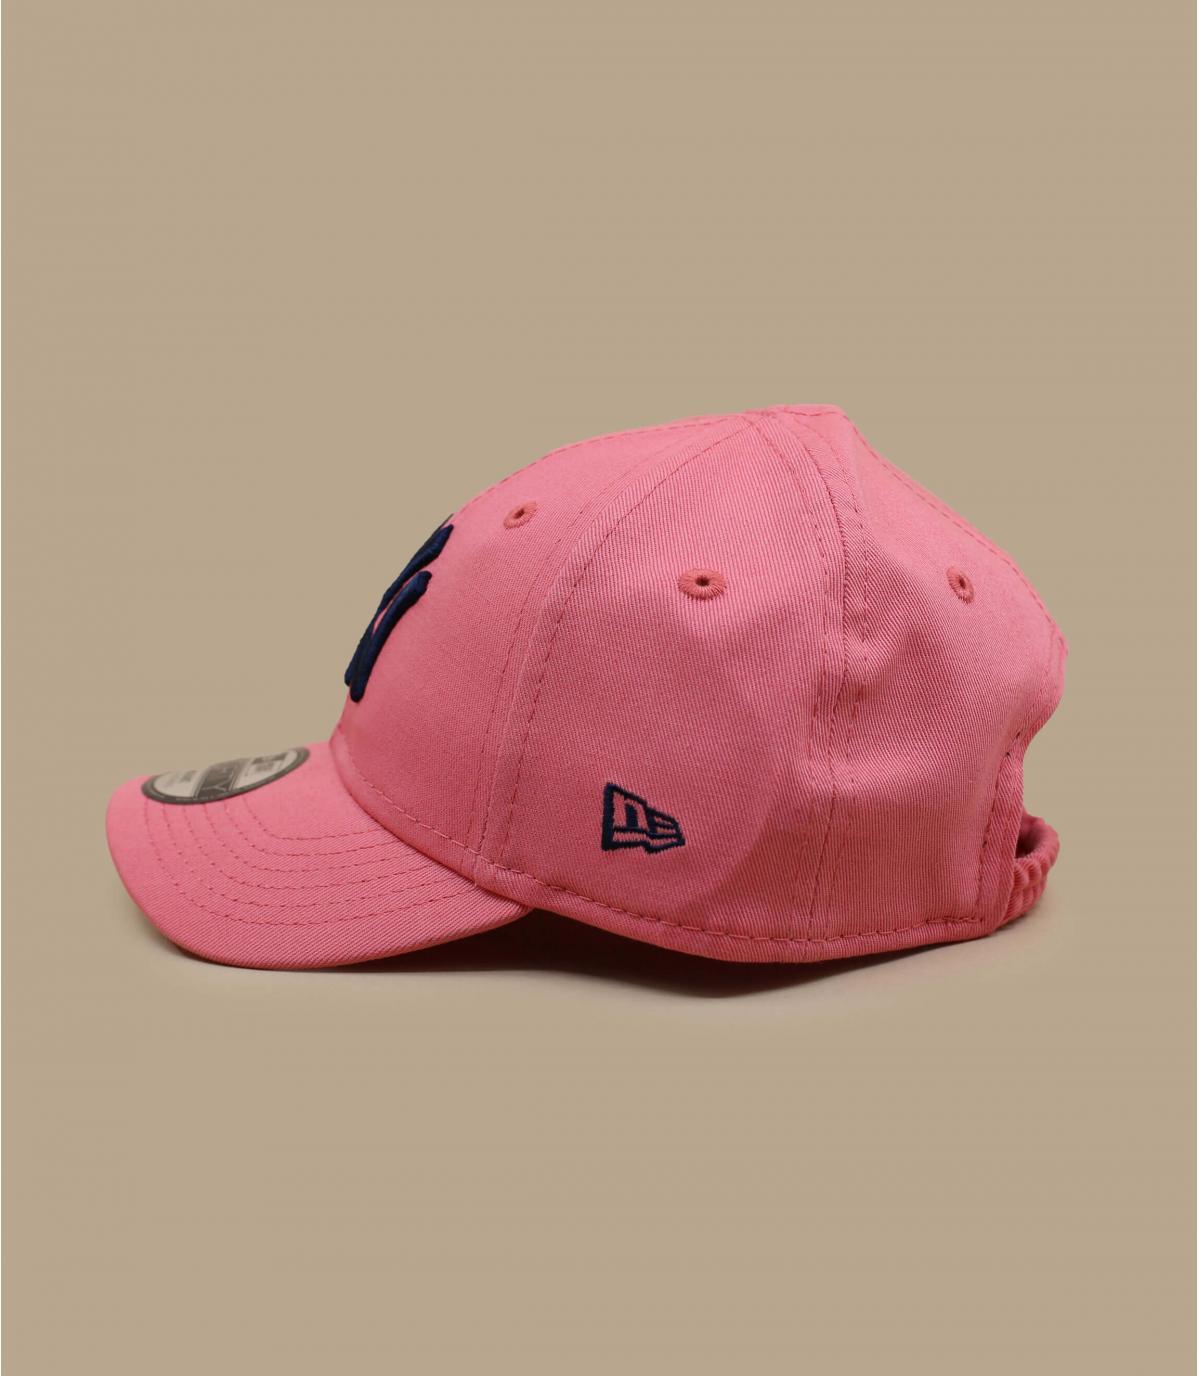 Détails Casquette Baby League Ess NY 940 pink navy - image 2